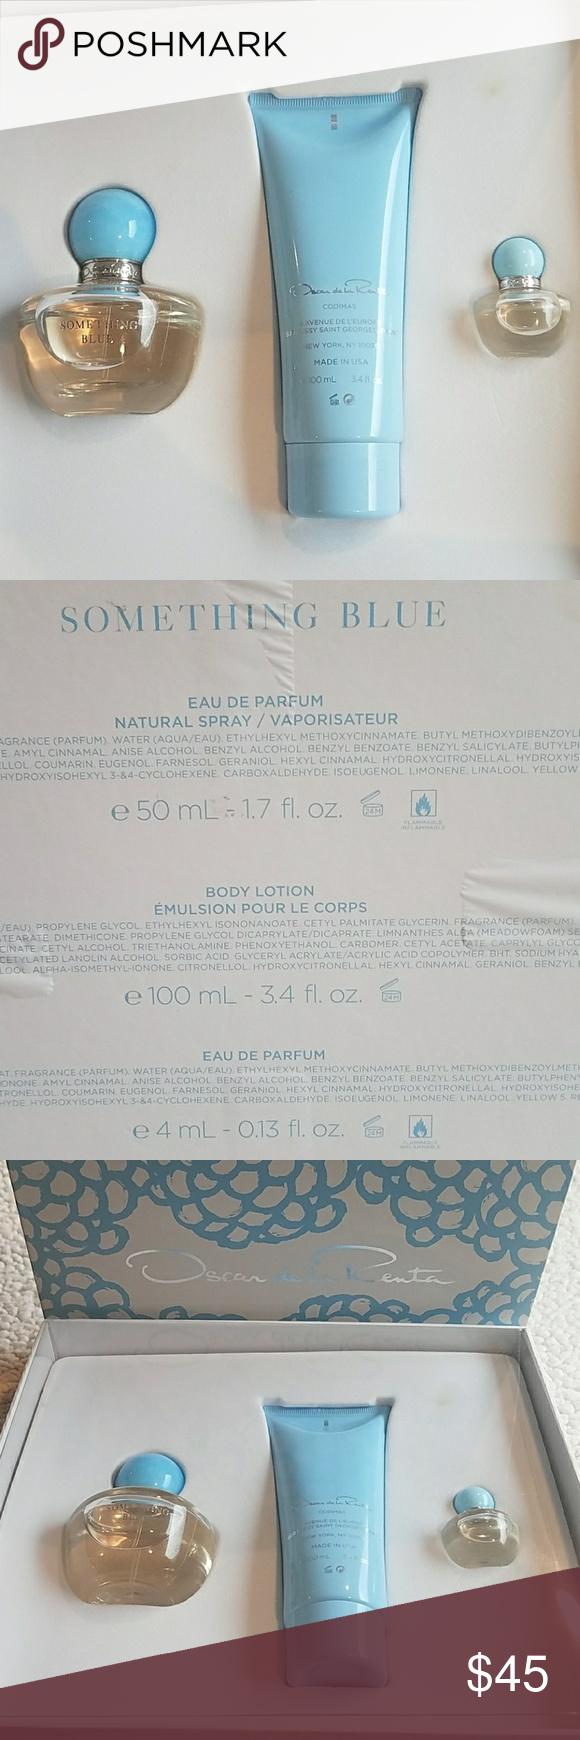 Oscar De La Renta Something Blue Set New In Box Never Used Pet And Smoke Free Home Oscar De La Renta Ot Something Blue Oscar De La Renta Things To Sell